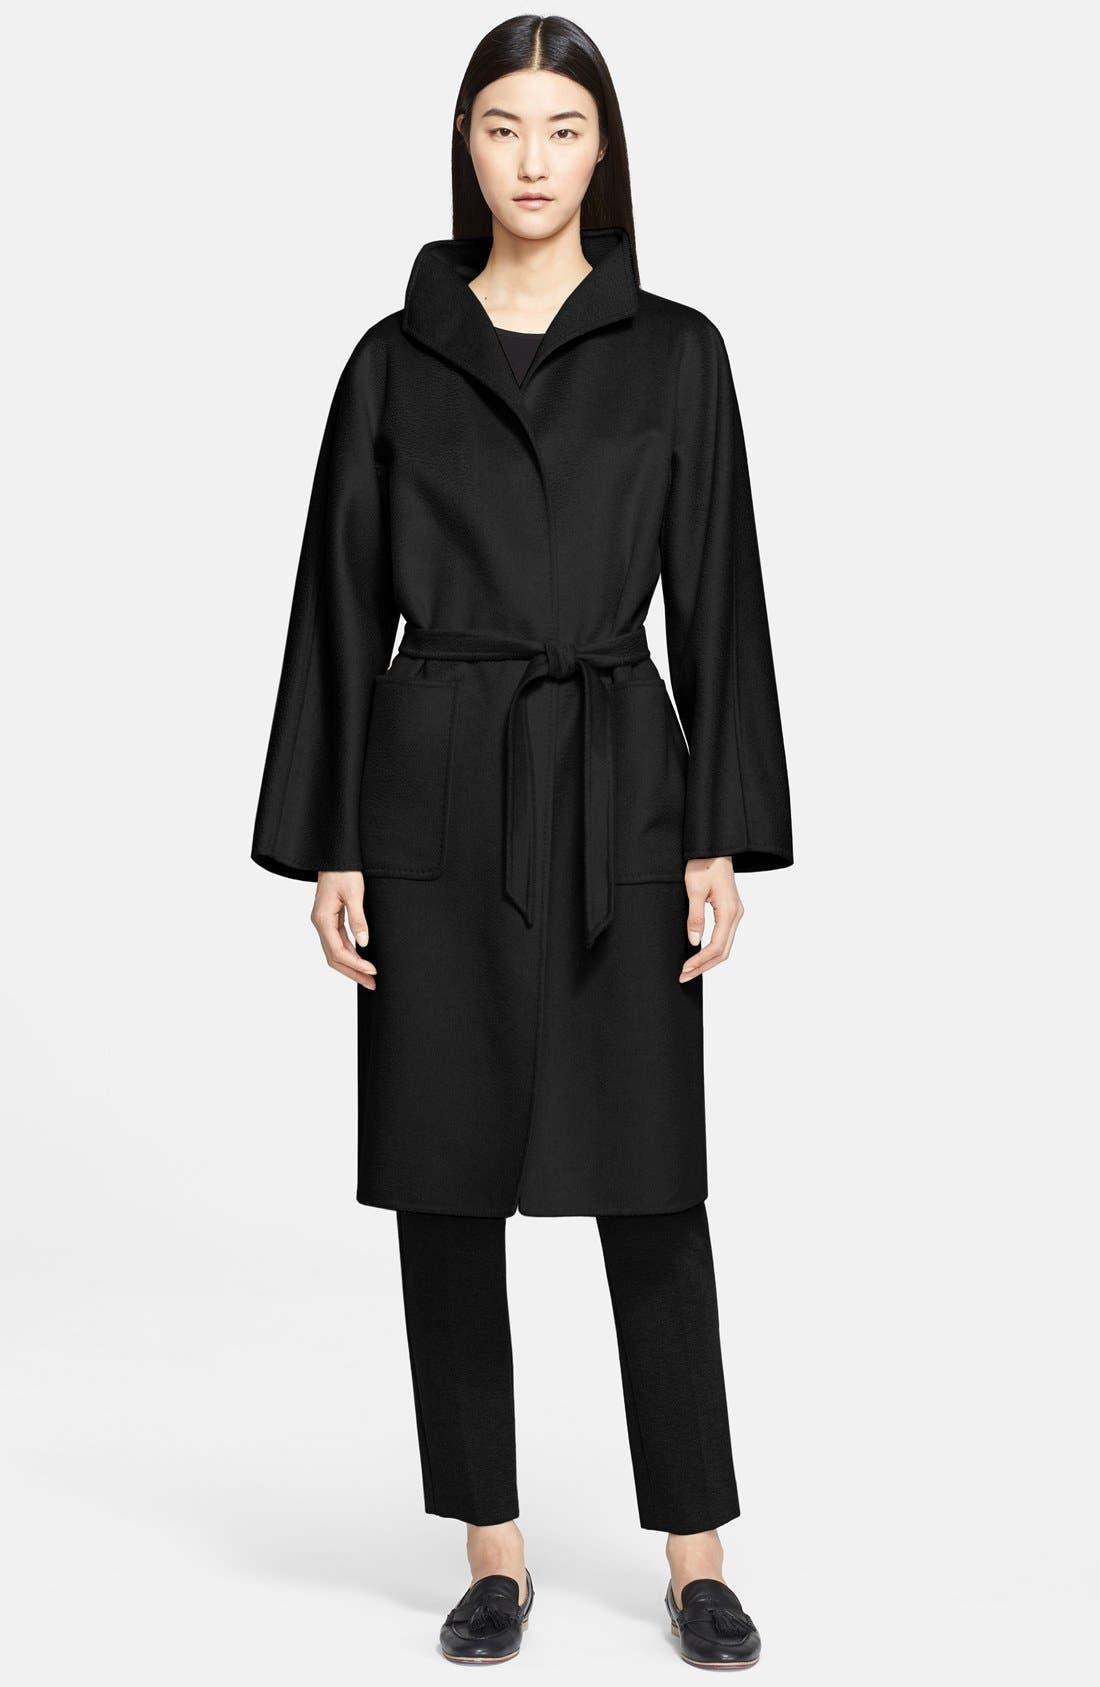 MAX MARA 'Lilia' Belted Cashmere Coat, Main, color, 001